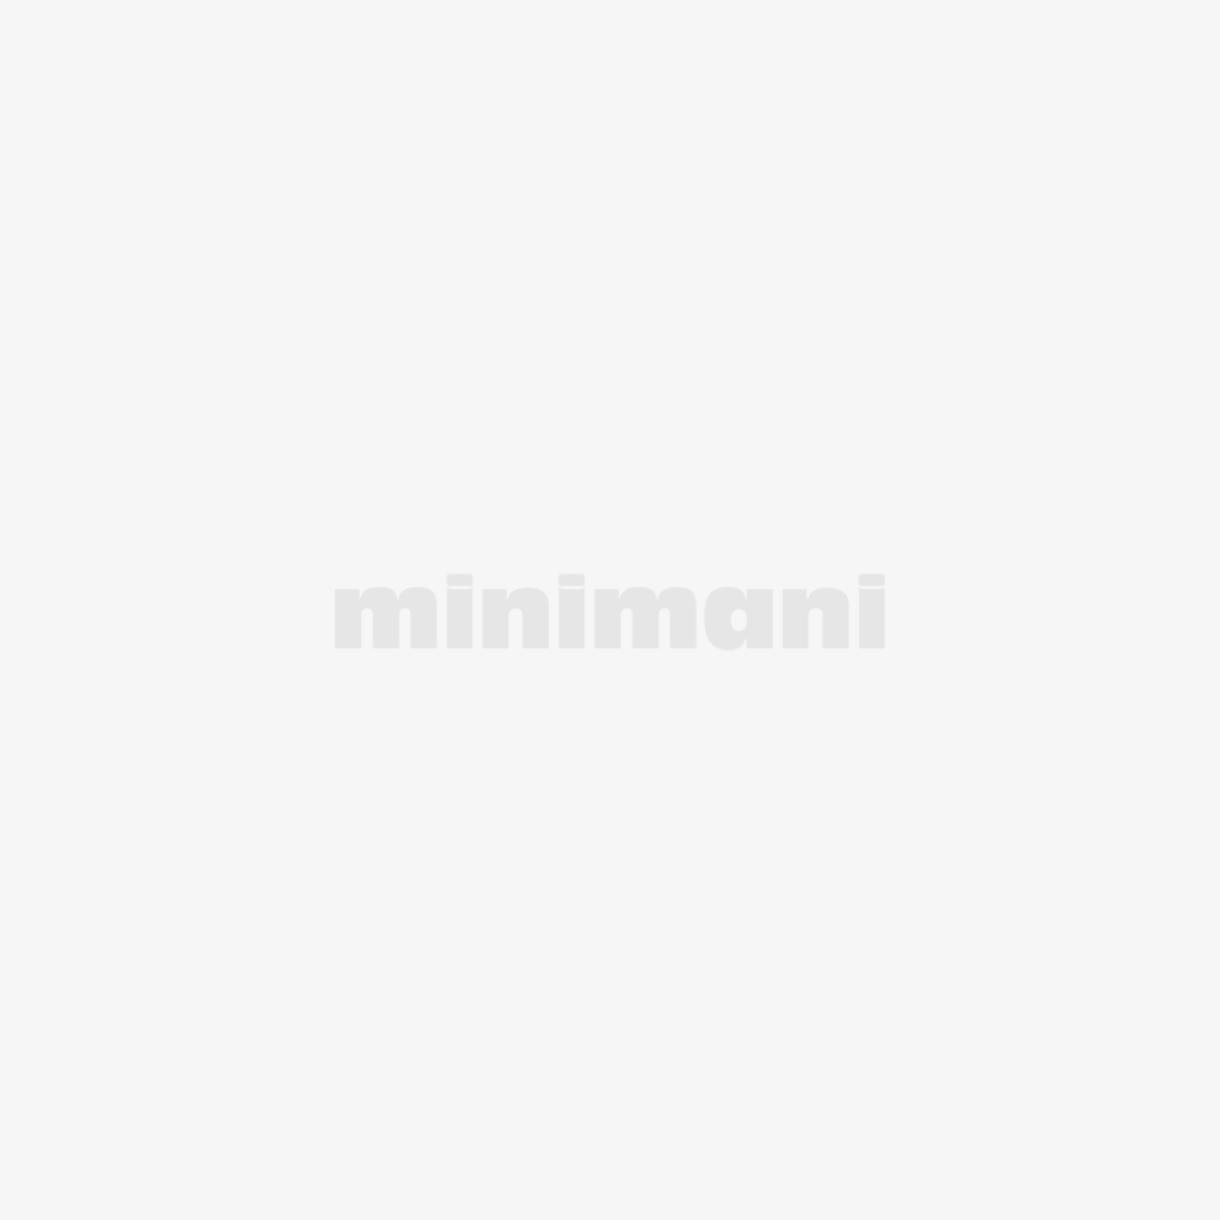 M-FILTER RAITISILMASUODATIN MAC 8024 ALMERA II,PRIMERA III